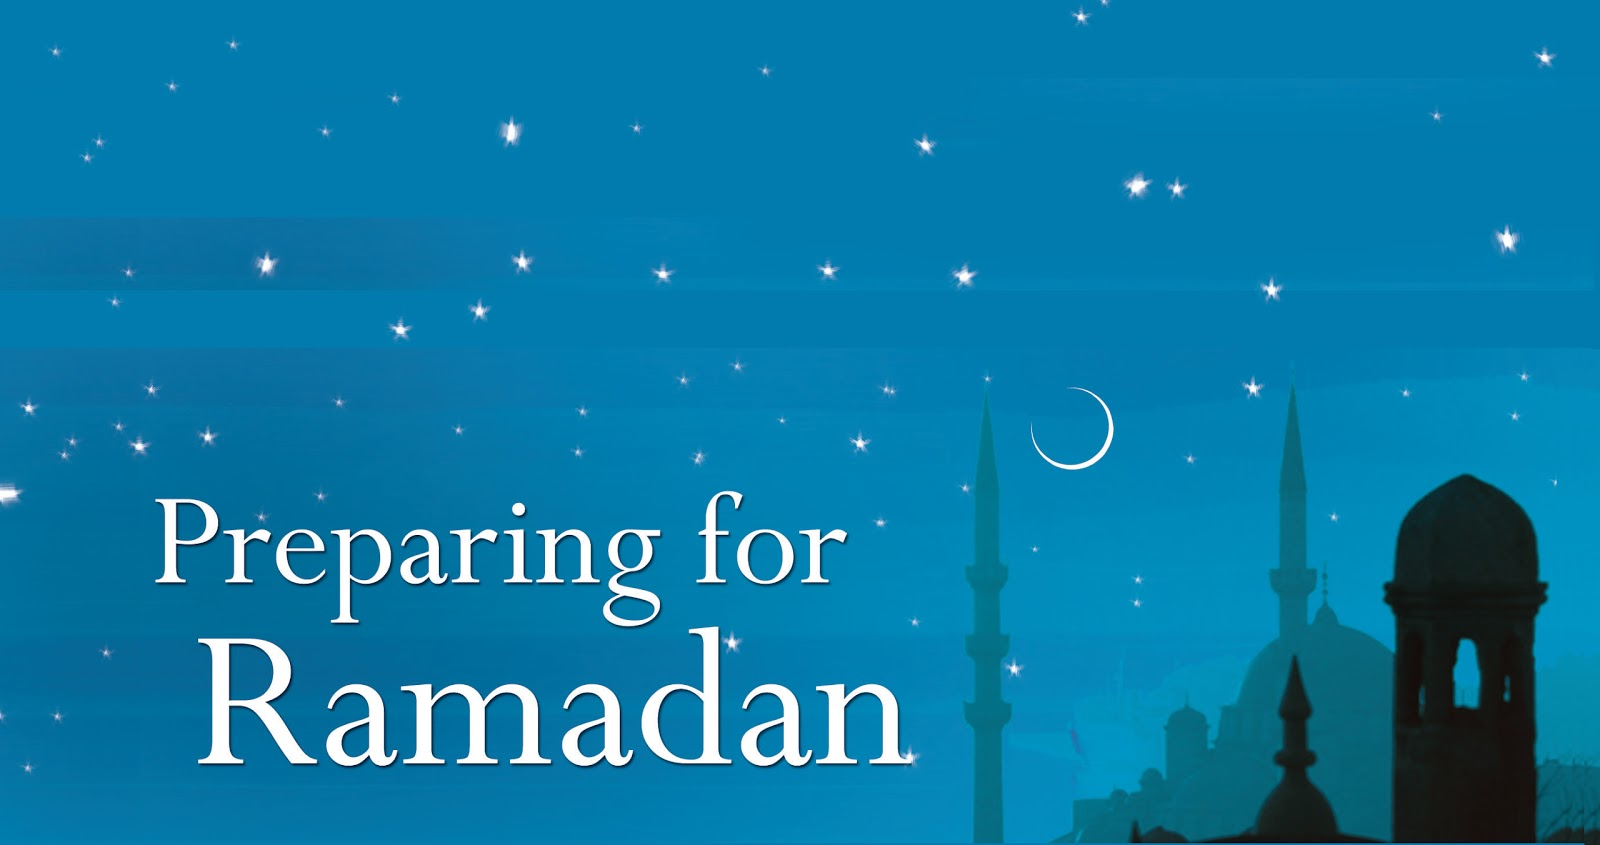 Hiba - The Blog: Preparing for Ramadan